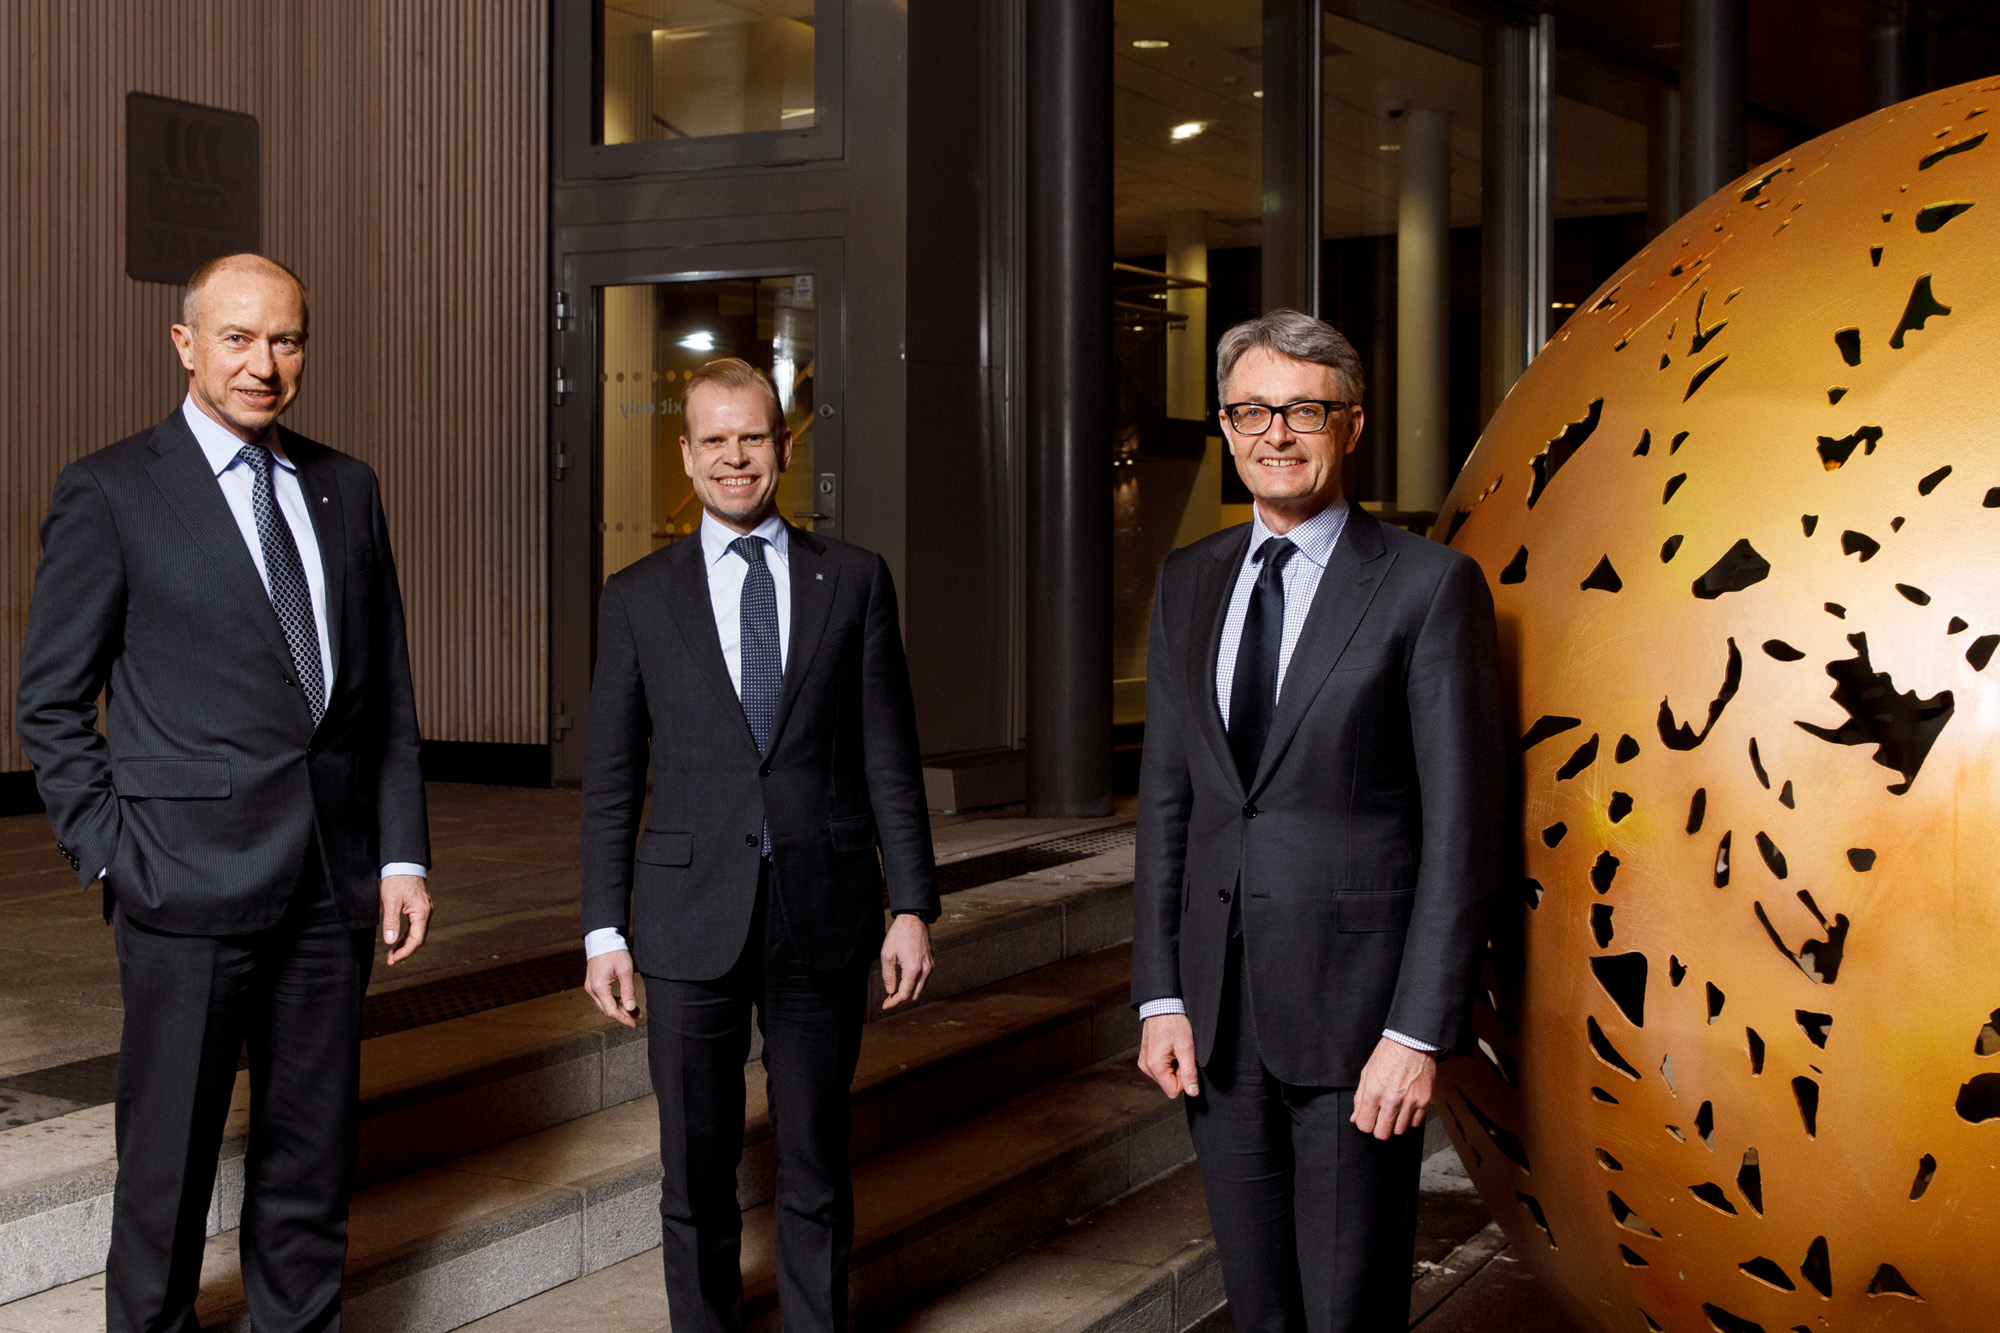 CEO's of Statkraft, Yara and Aker ASA